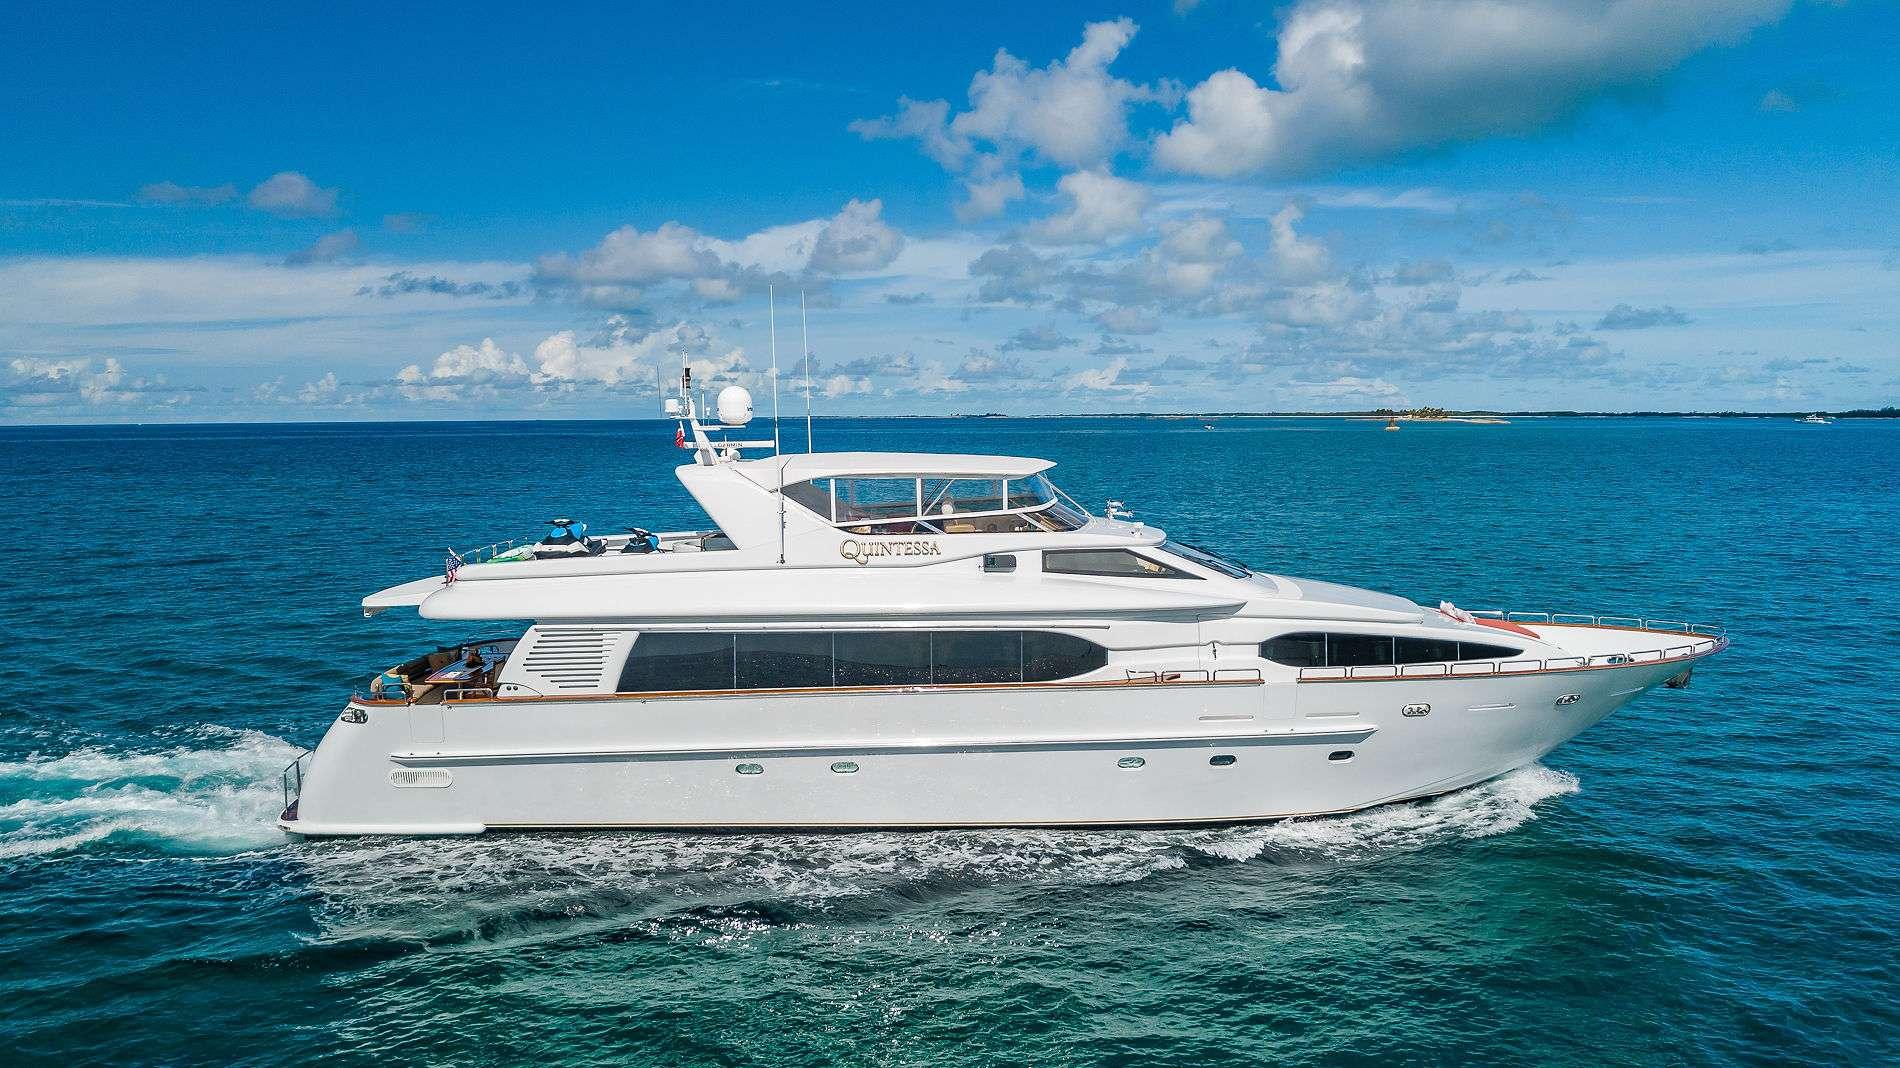 Motor Yacht QUINTESSA Profile